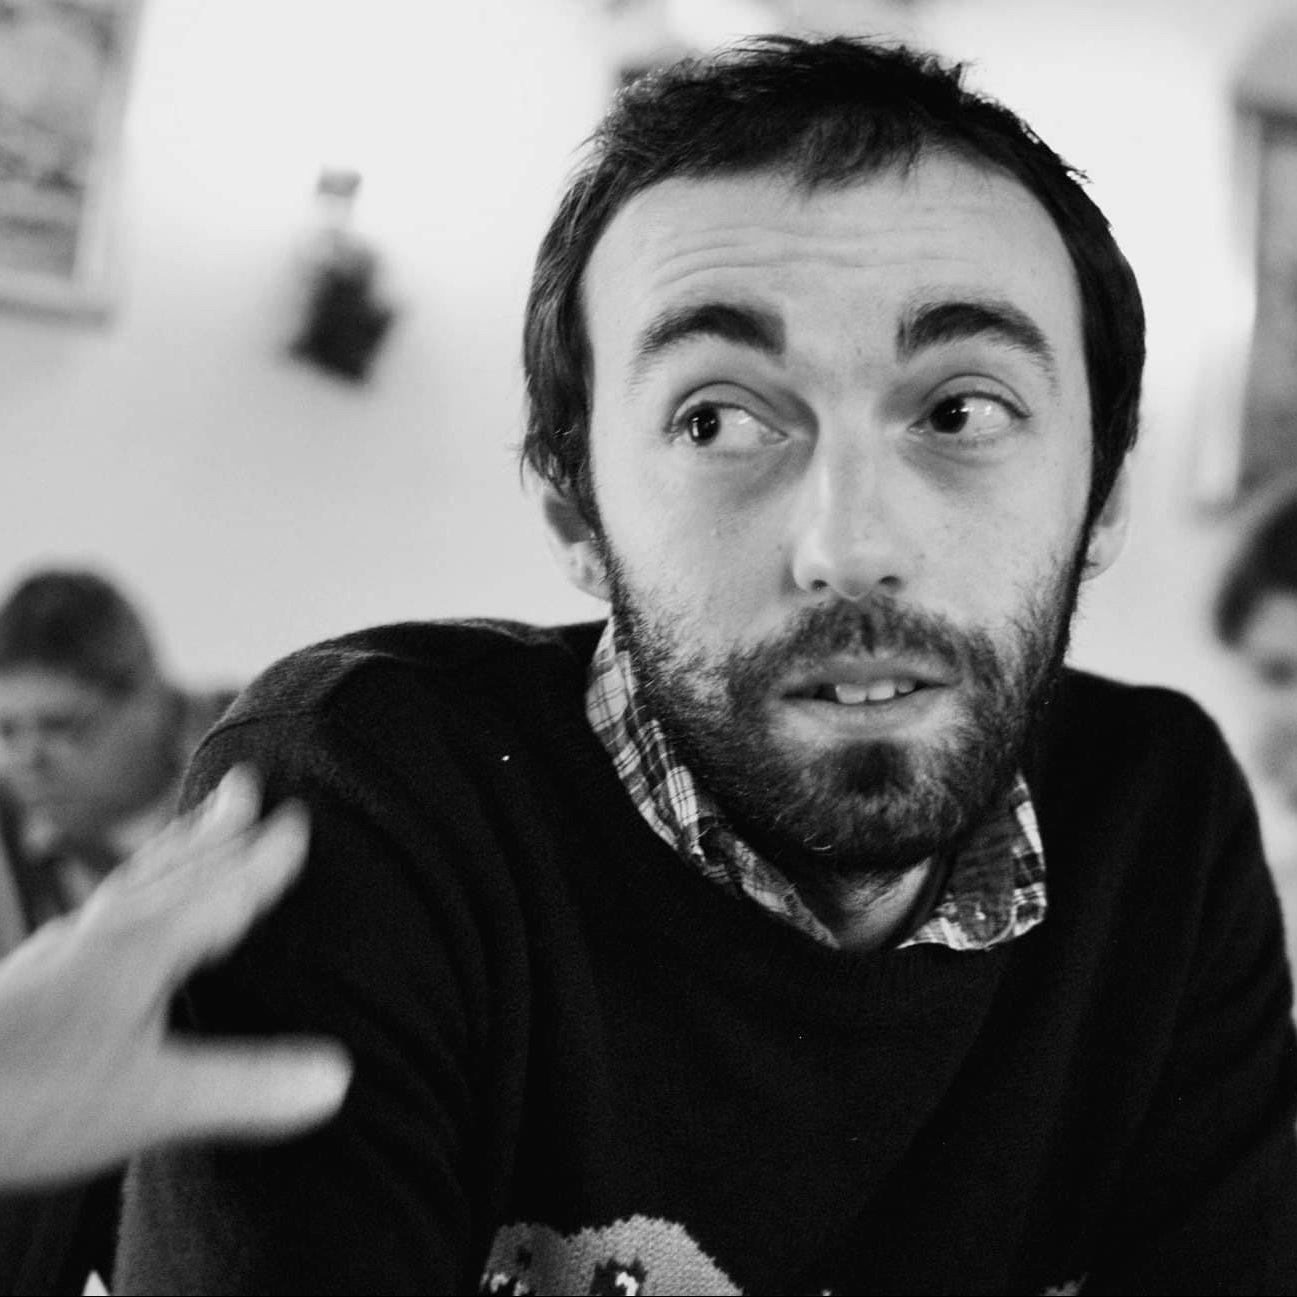 Stefan Rusinov headshot